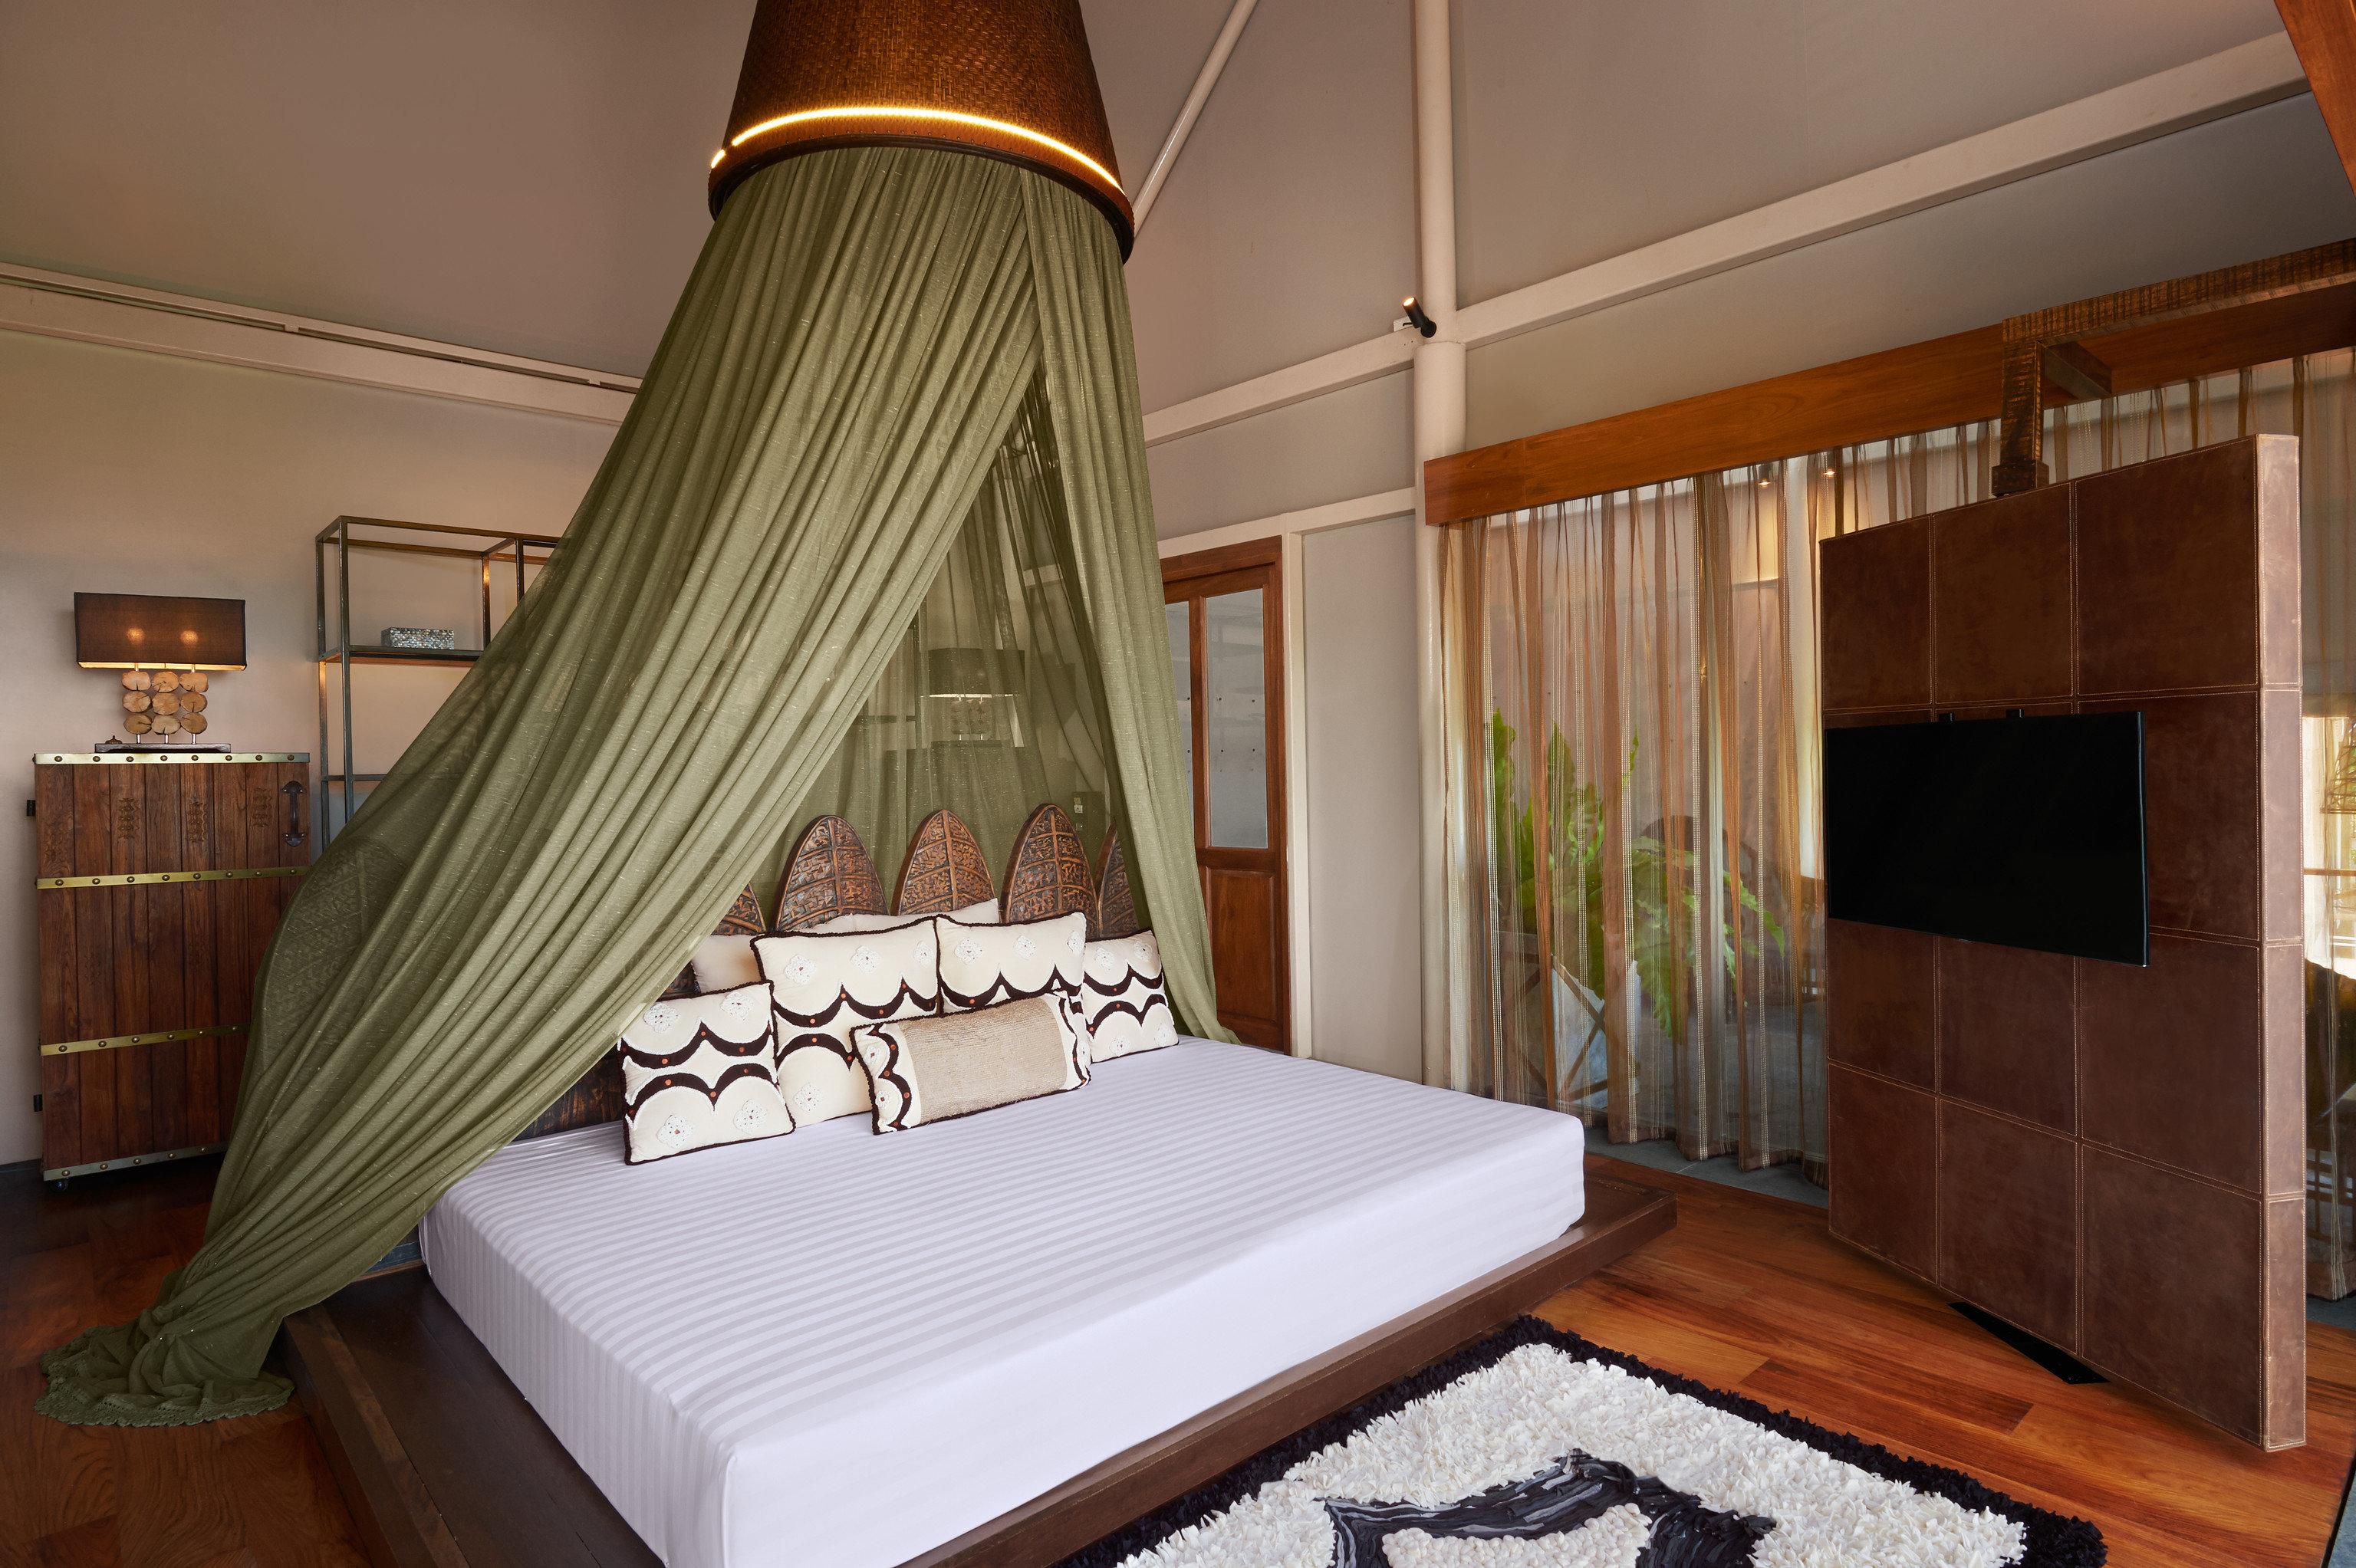 Hotels indoor floor wall room property Bedroom Living interior design bed Suite estate furniture cottage decorated wood